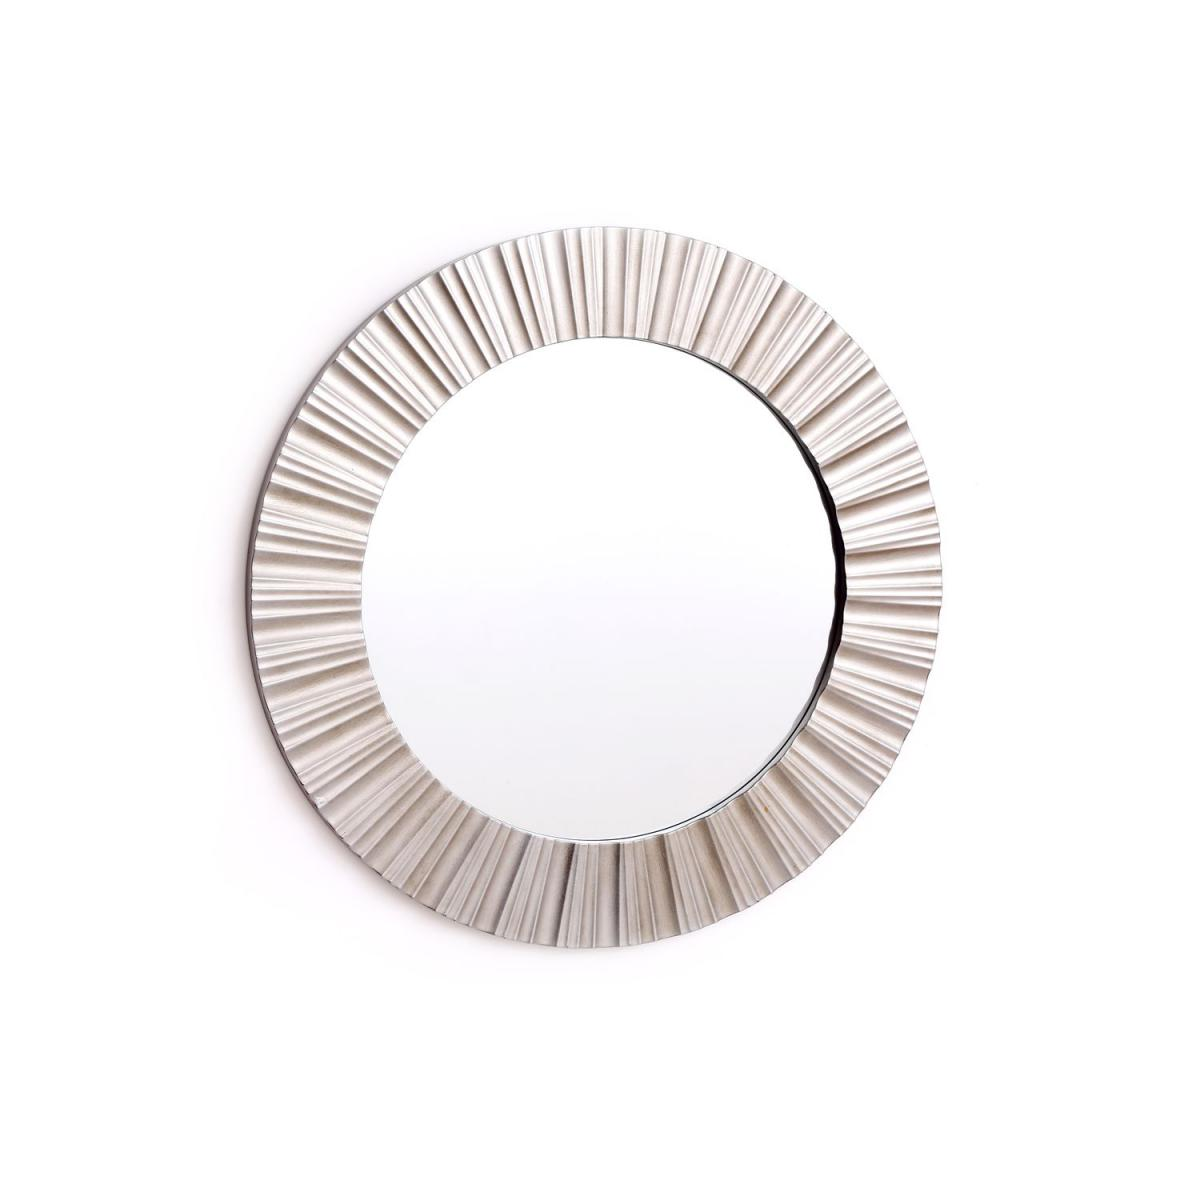 Heart Of The Home Miroir rond en métal design Champa - Diam. 50 cm - Argent